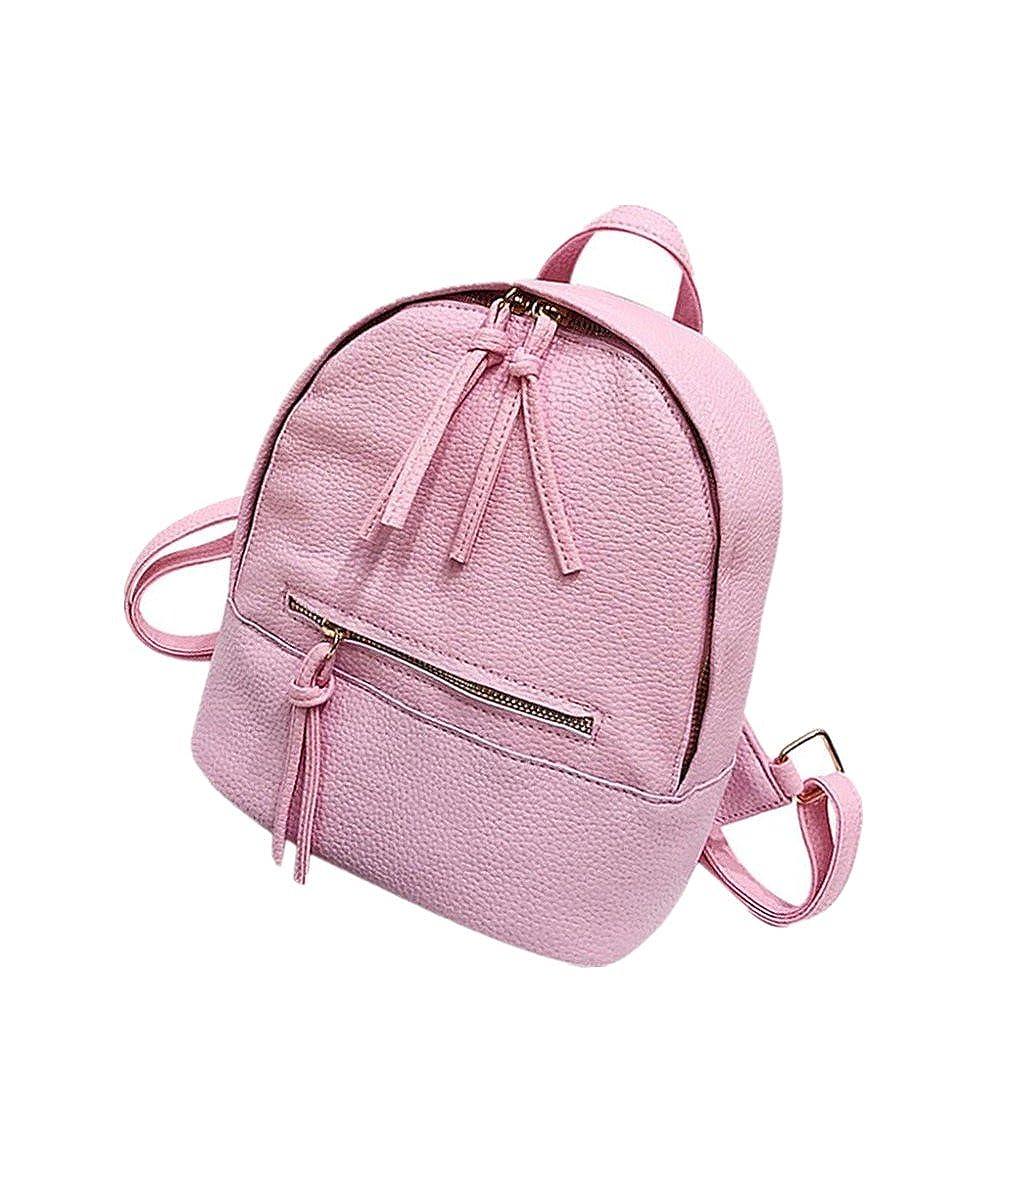 erthome Women Girl School Bag Preppy Style Letter Backpack Mini Travel Shoulder Bag